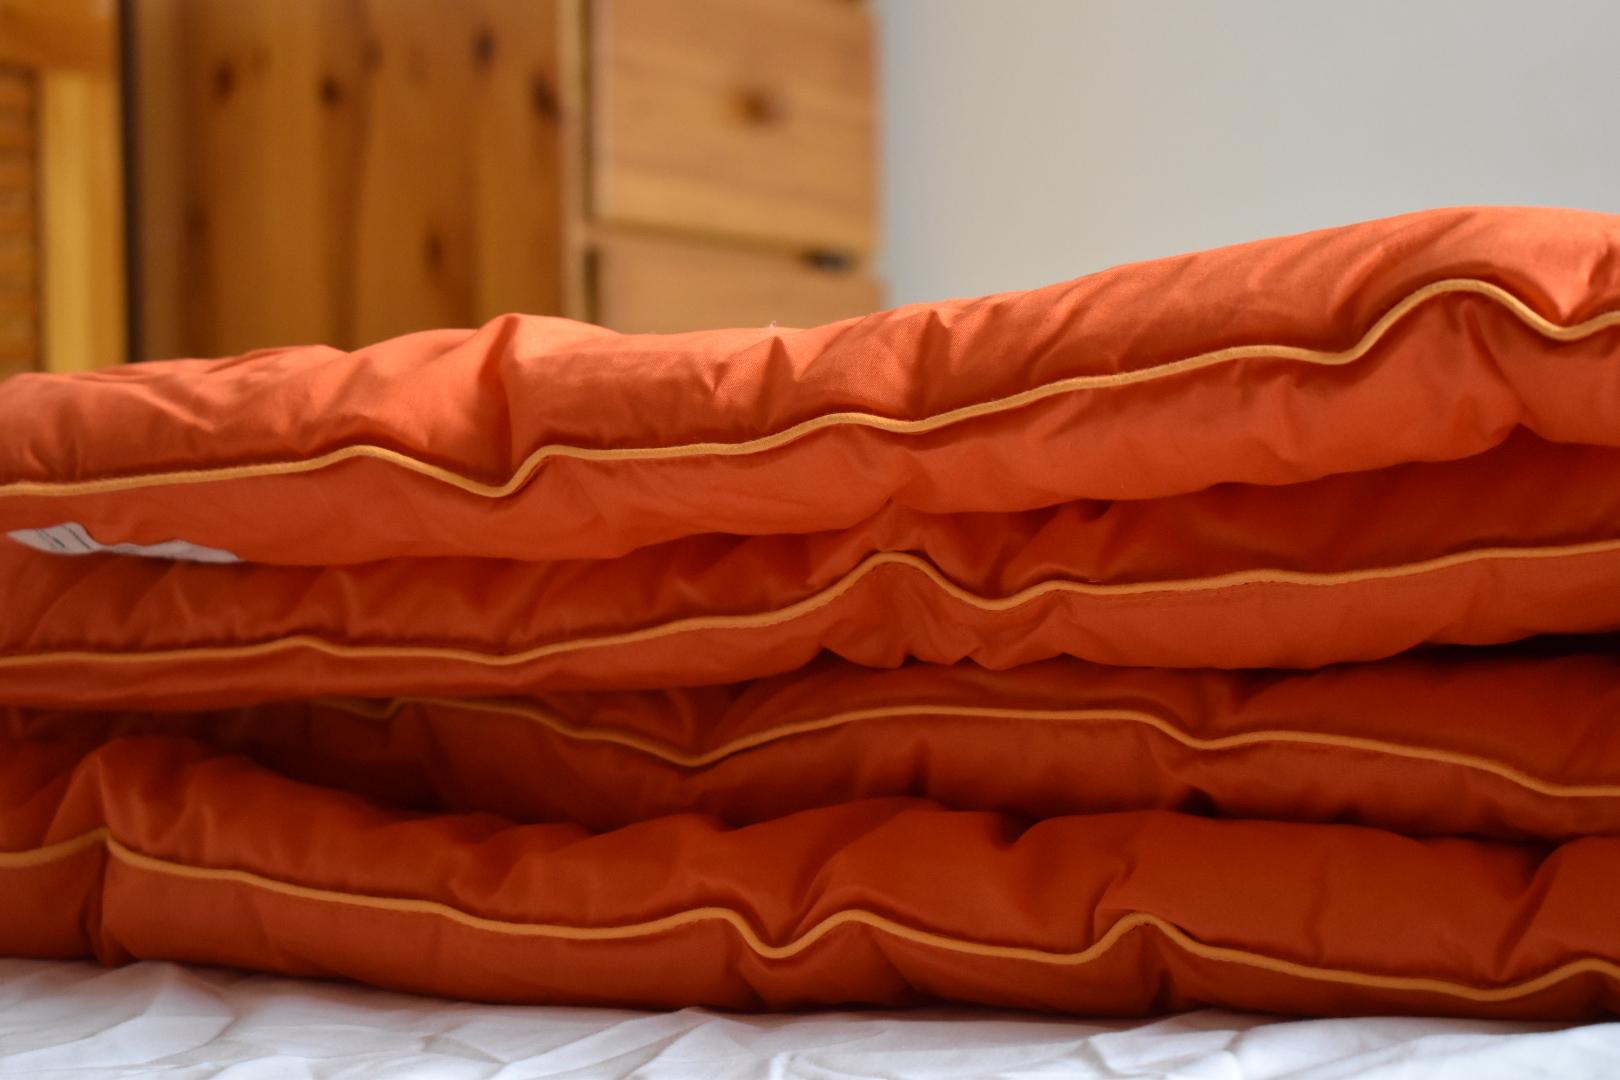 Blooms coverless duvets - orange